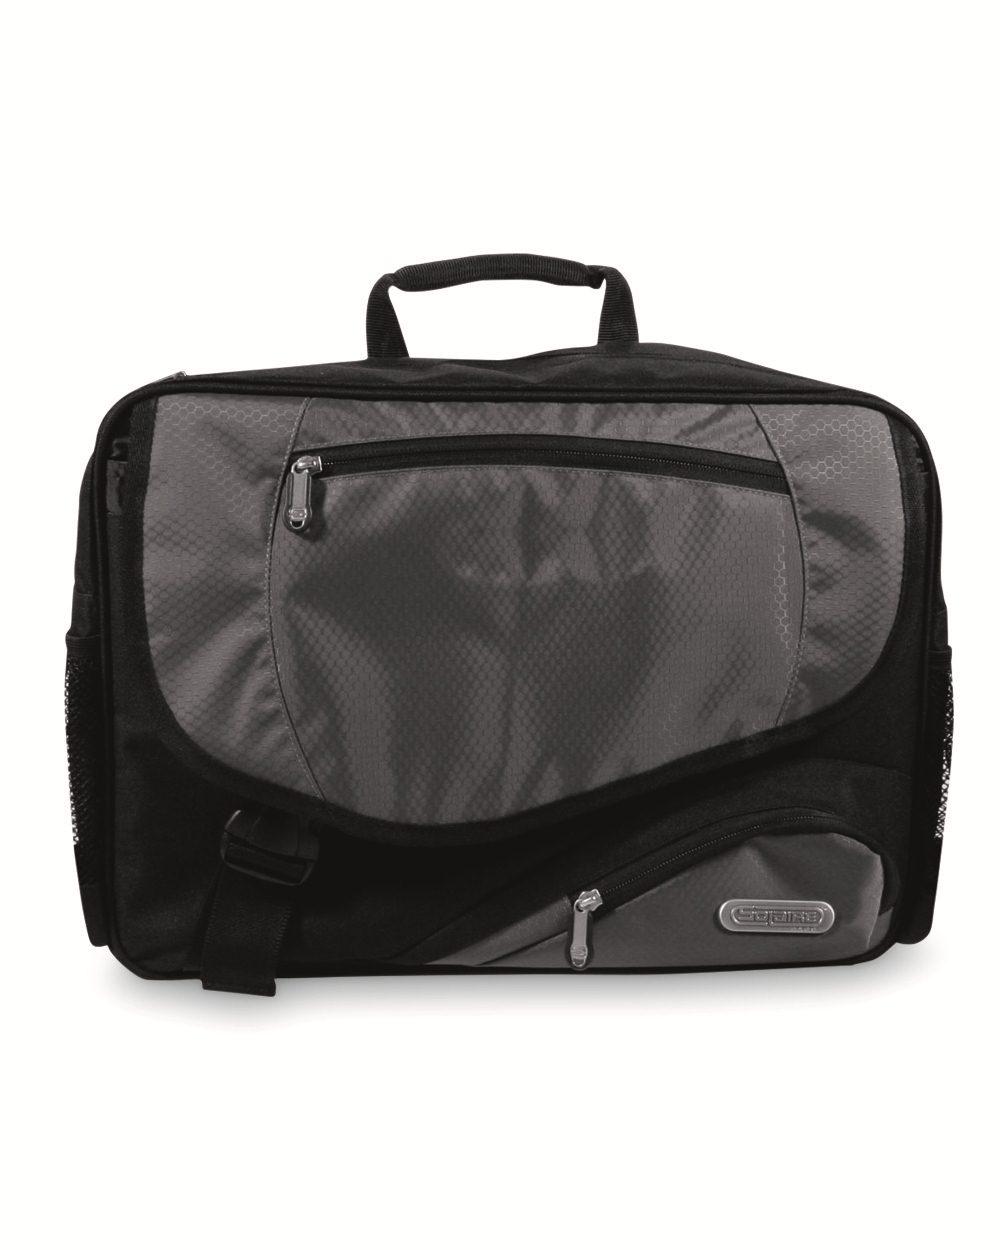 Valubag Laptop Briefcase - VB1159